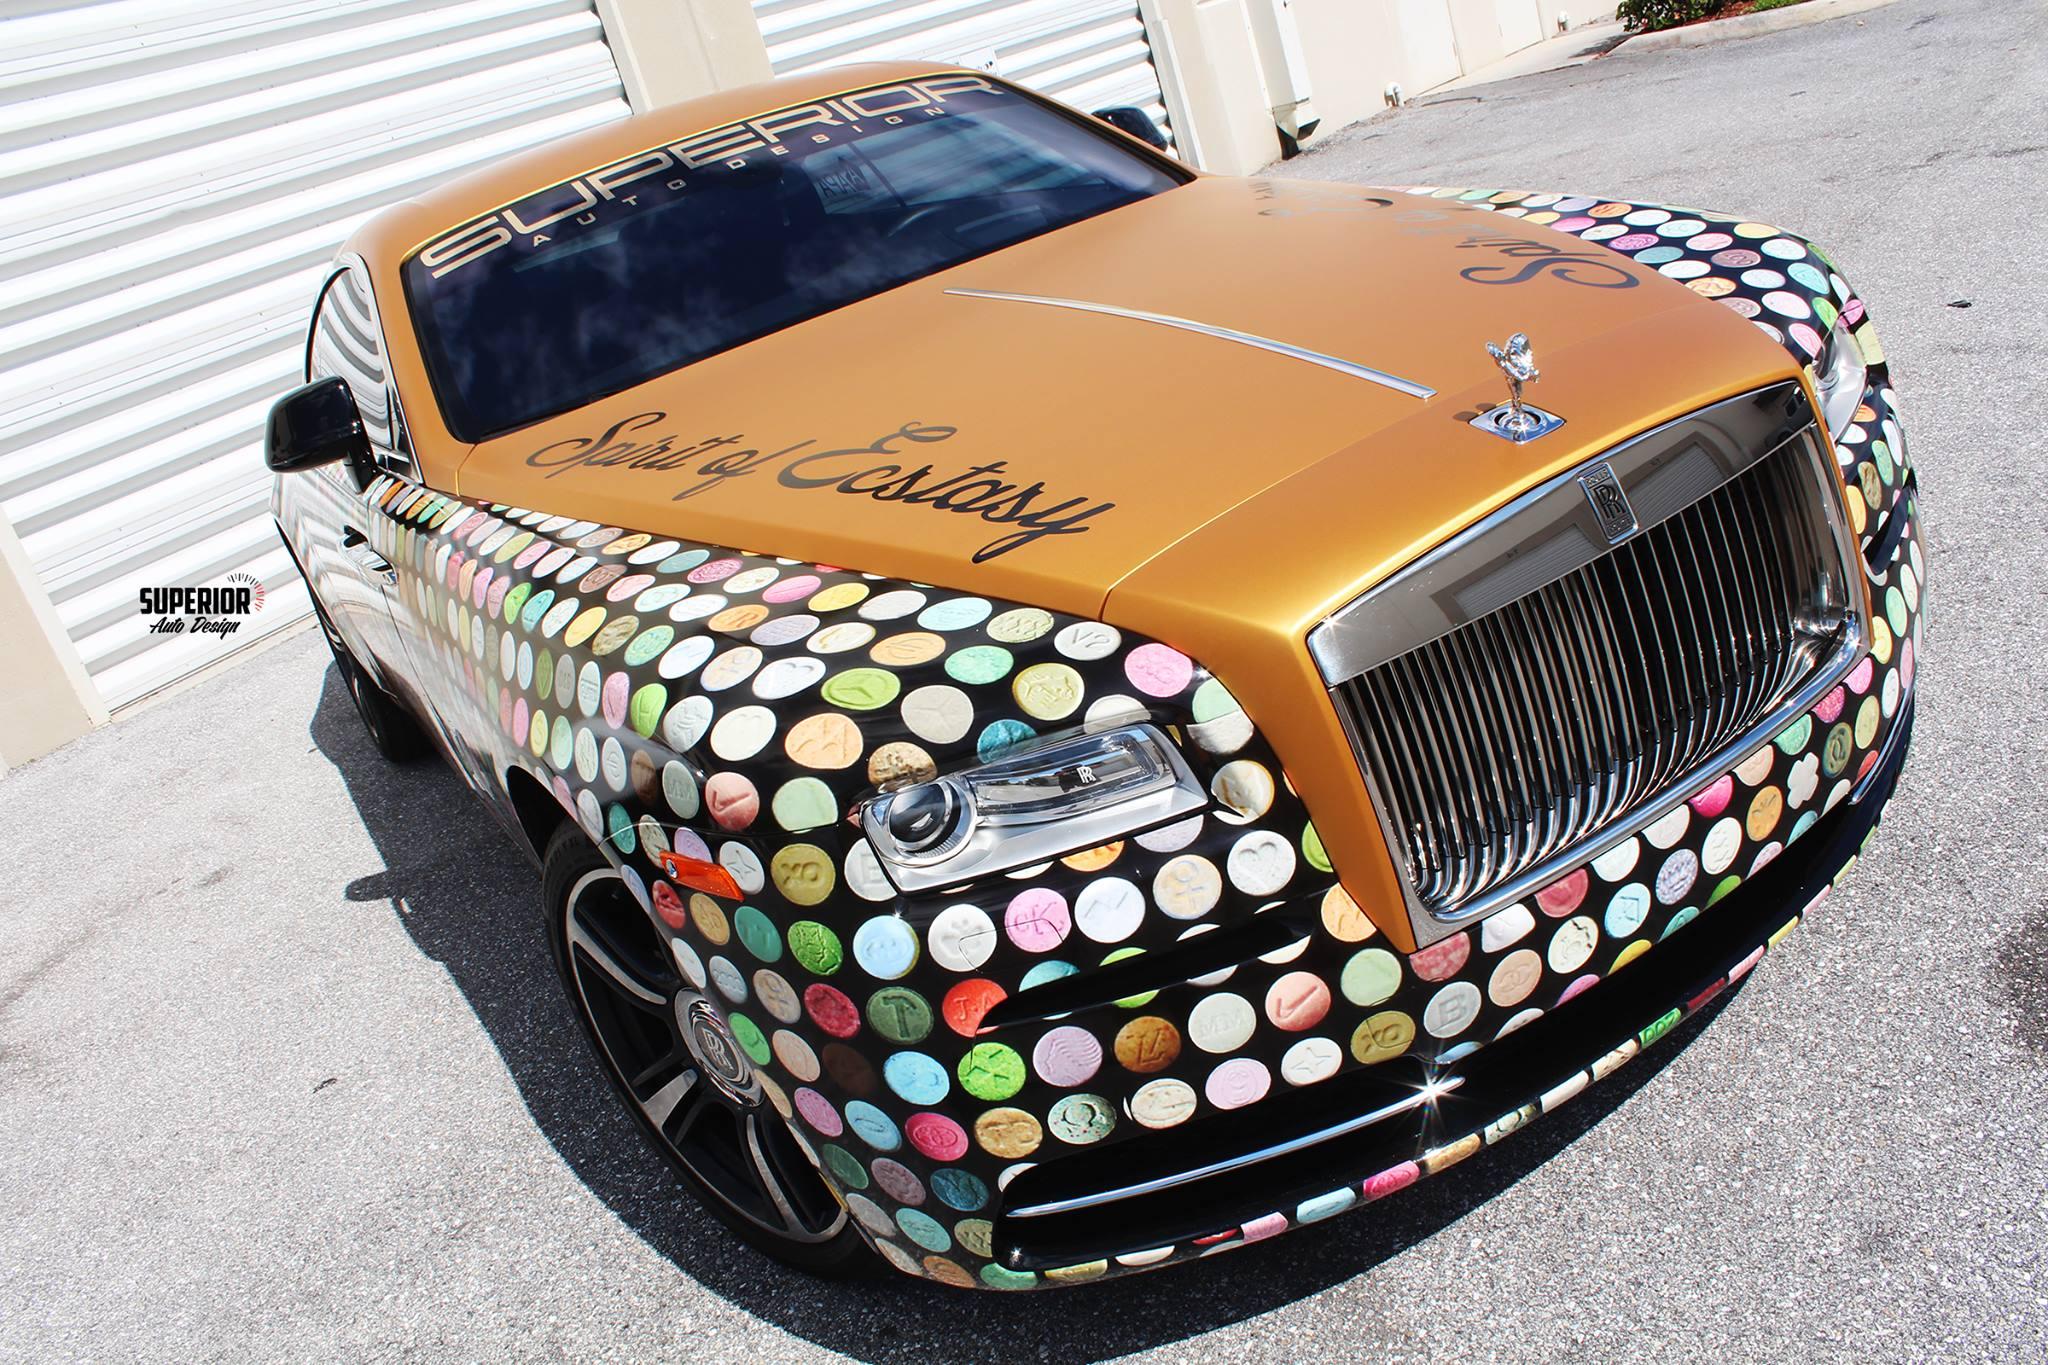 rolls-royce-goldrush-rally-superior-auto-design-3